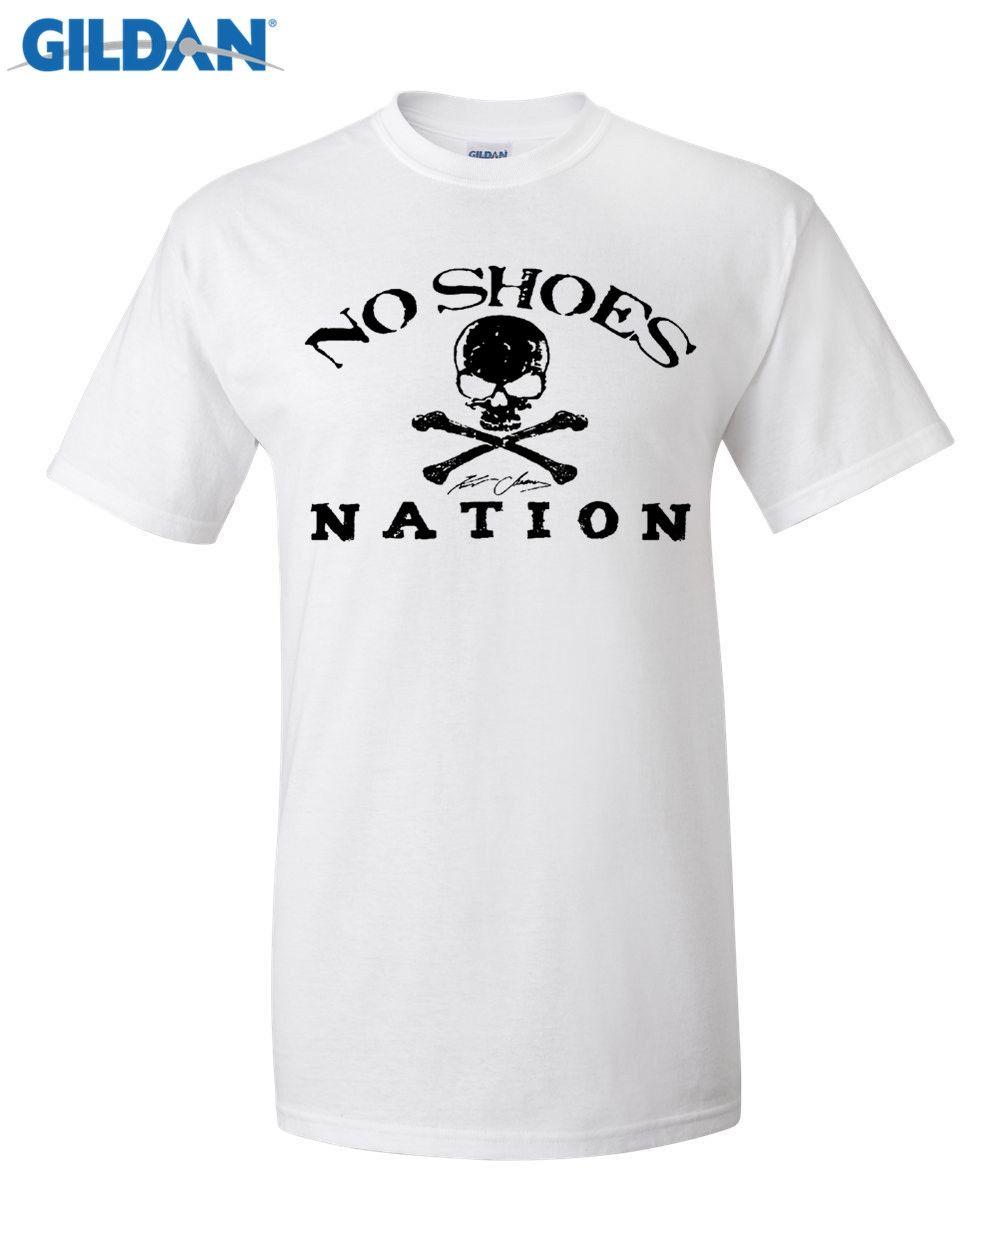 Gildan Designer T Shirt Cheap Summer T Shirt Kenny Chesney No Shoes